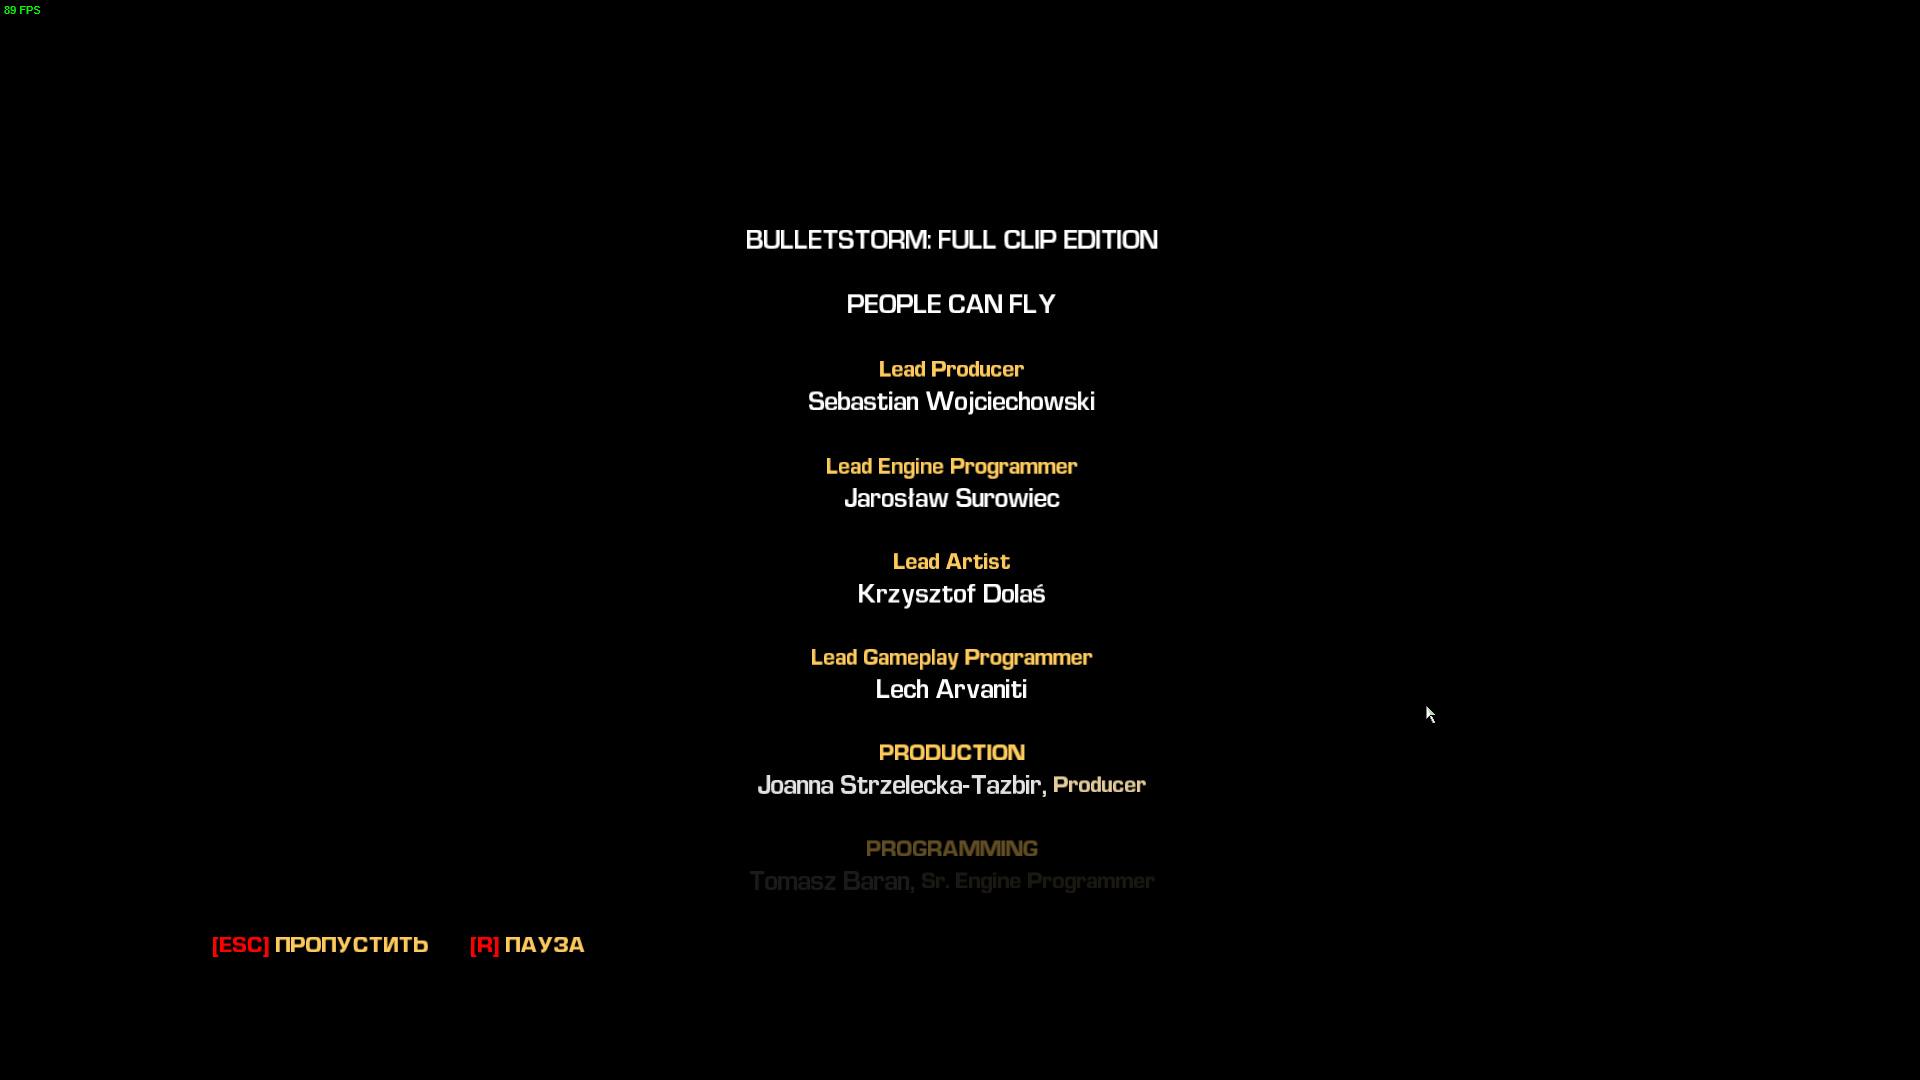 StormGame-Win64-Shipping 2017-09-04 00-37-38-289.jpg - Bulletstorm